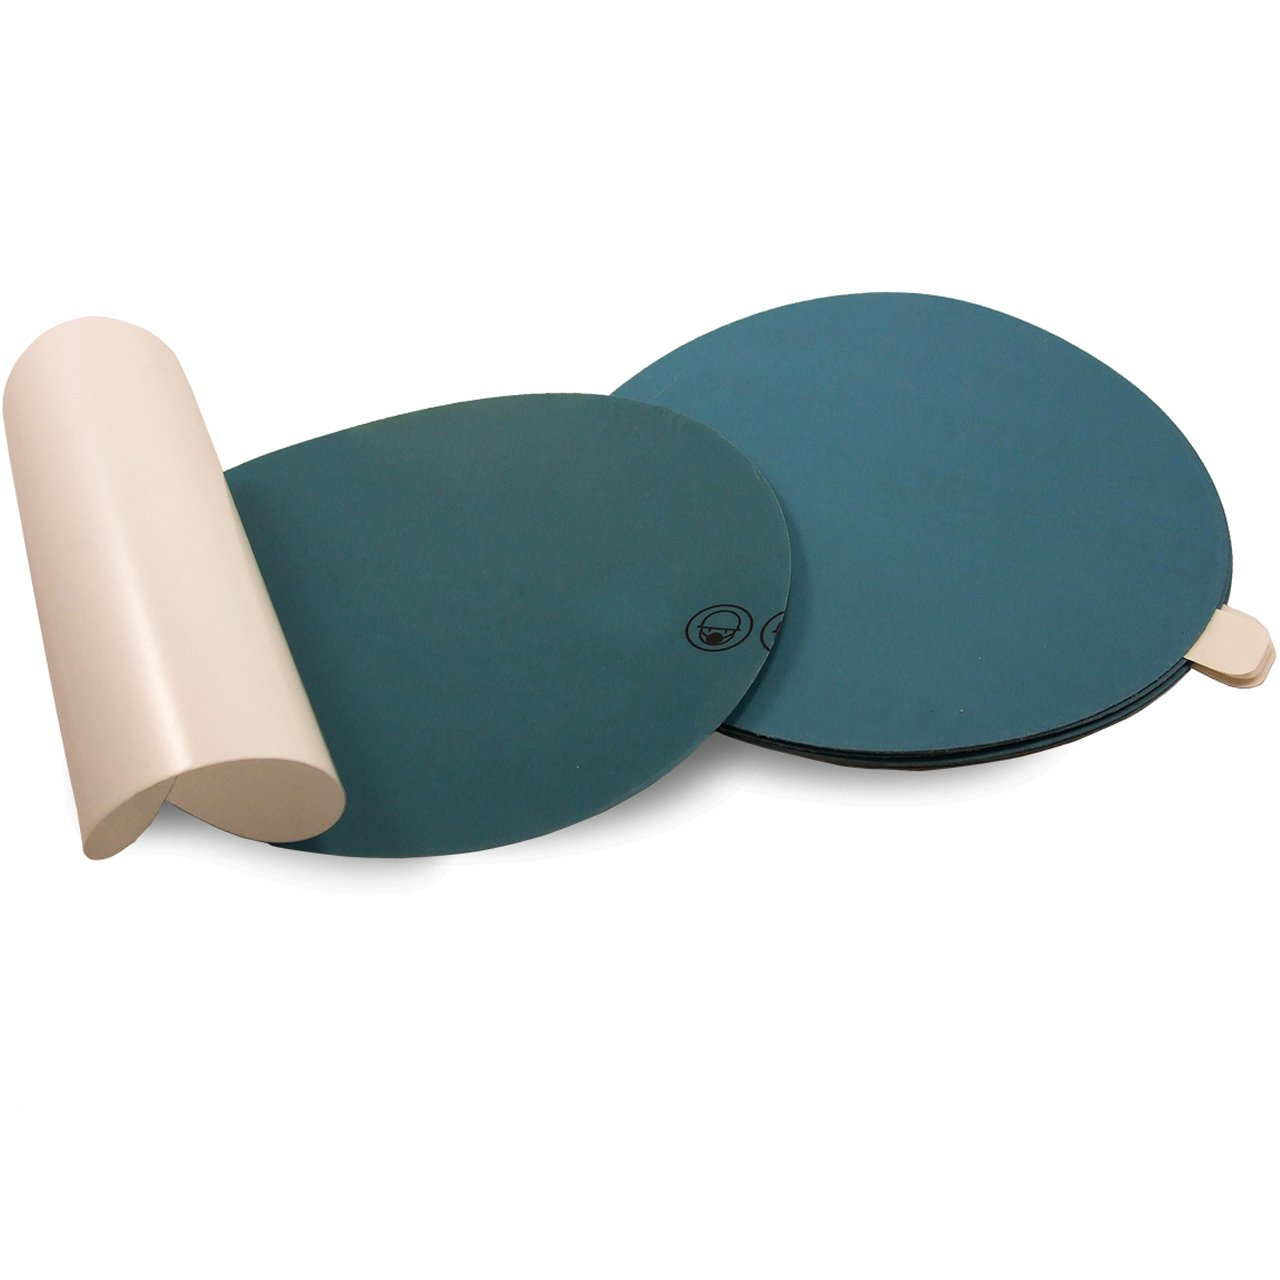 PSA 50-Pack Auto Body Film Sanding Discs 6 Inch 400 Grit Adhesive Back